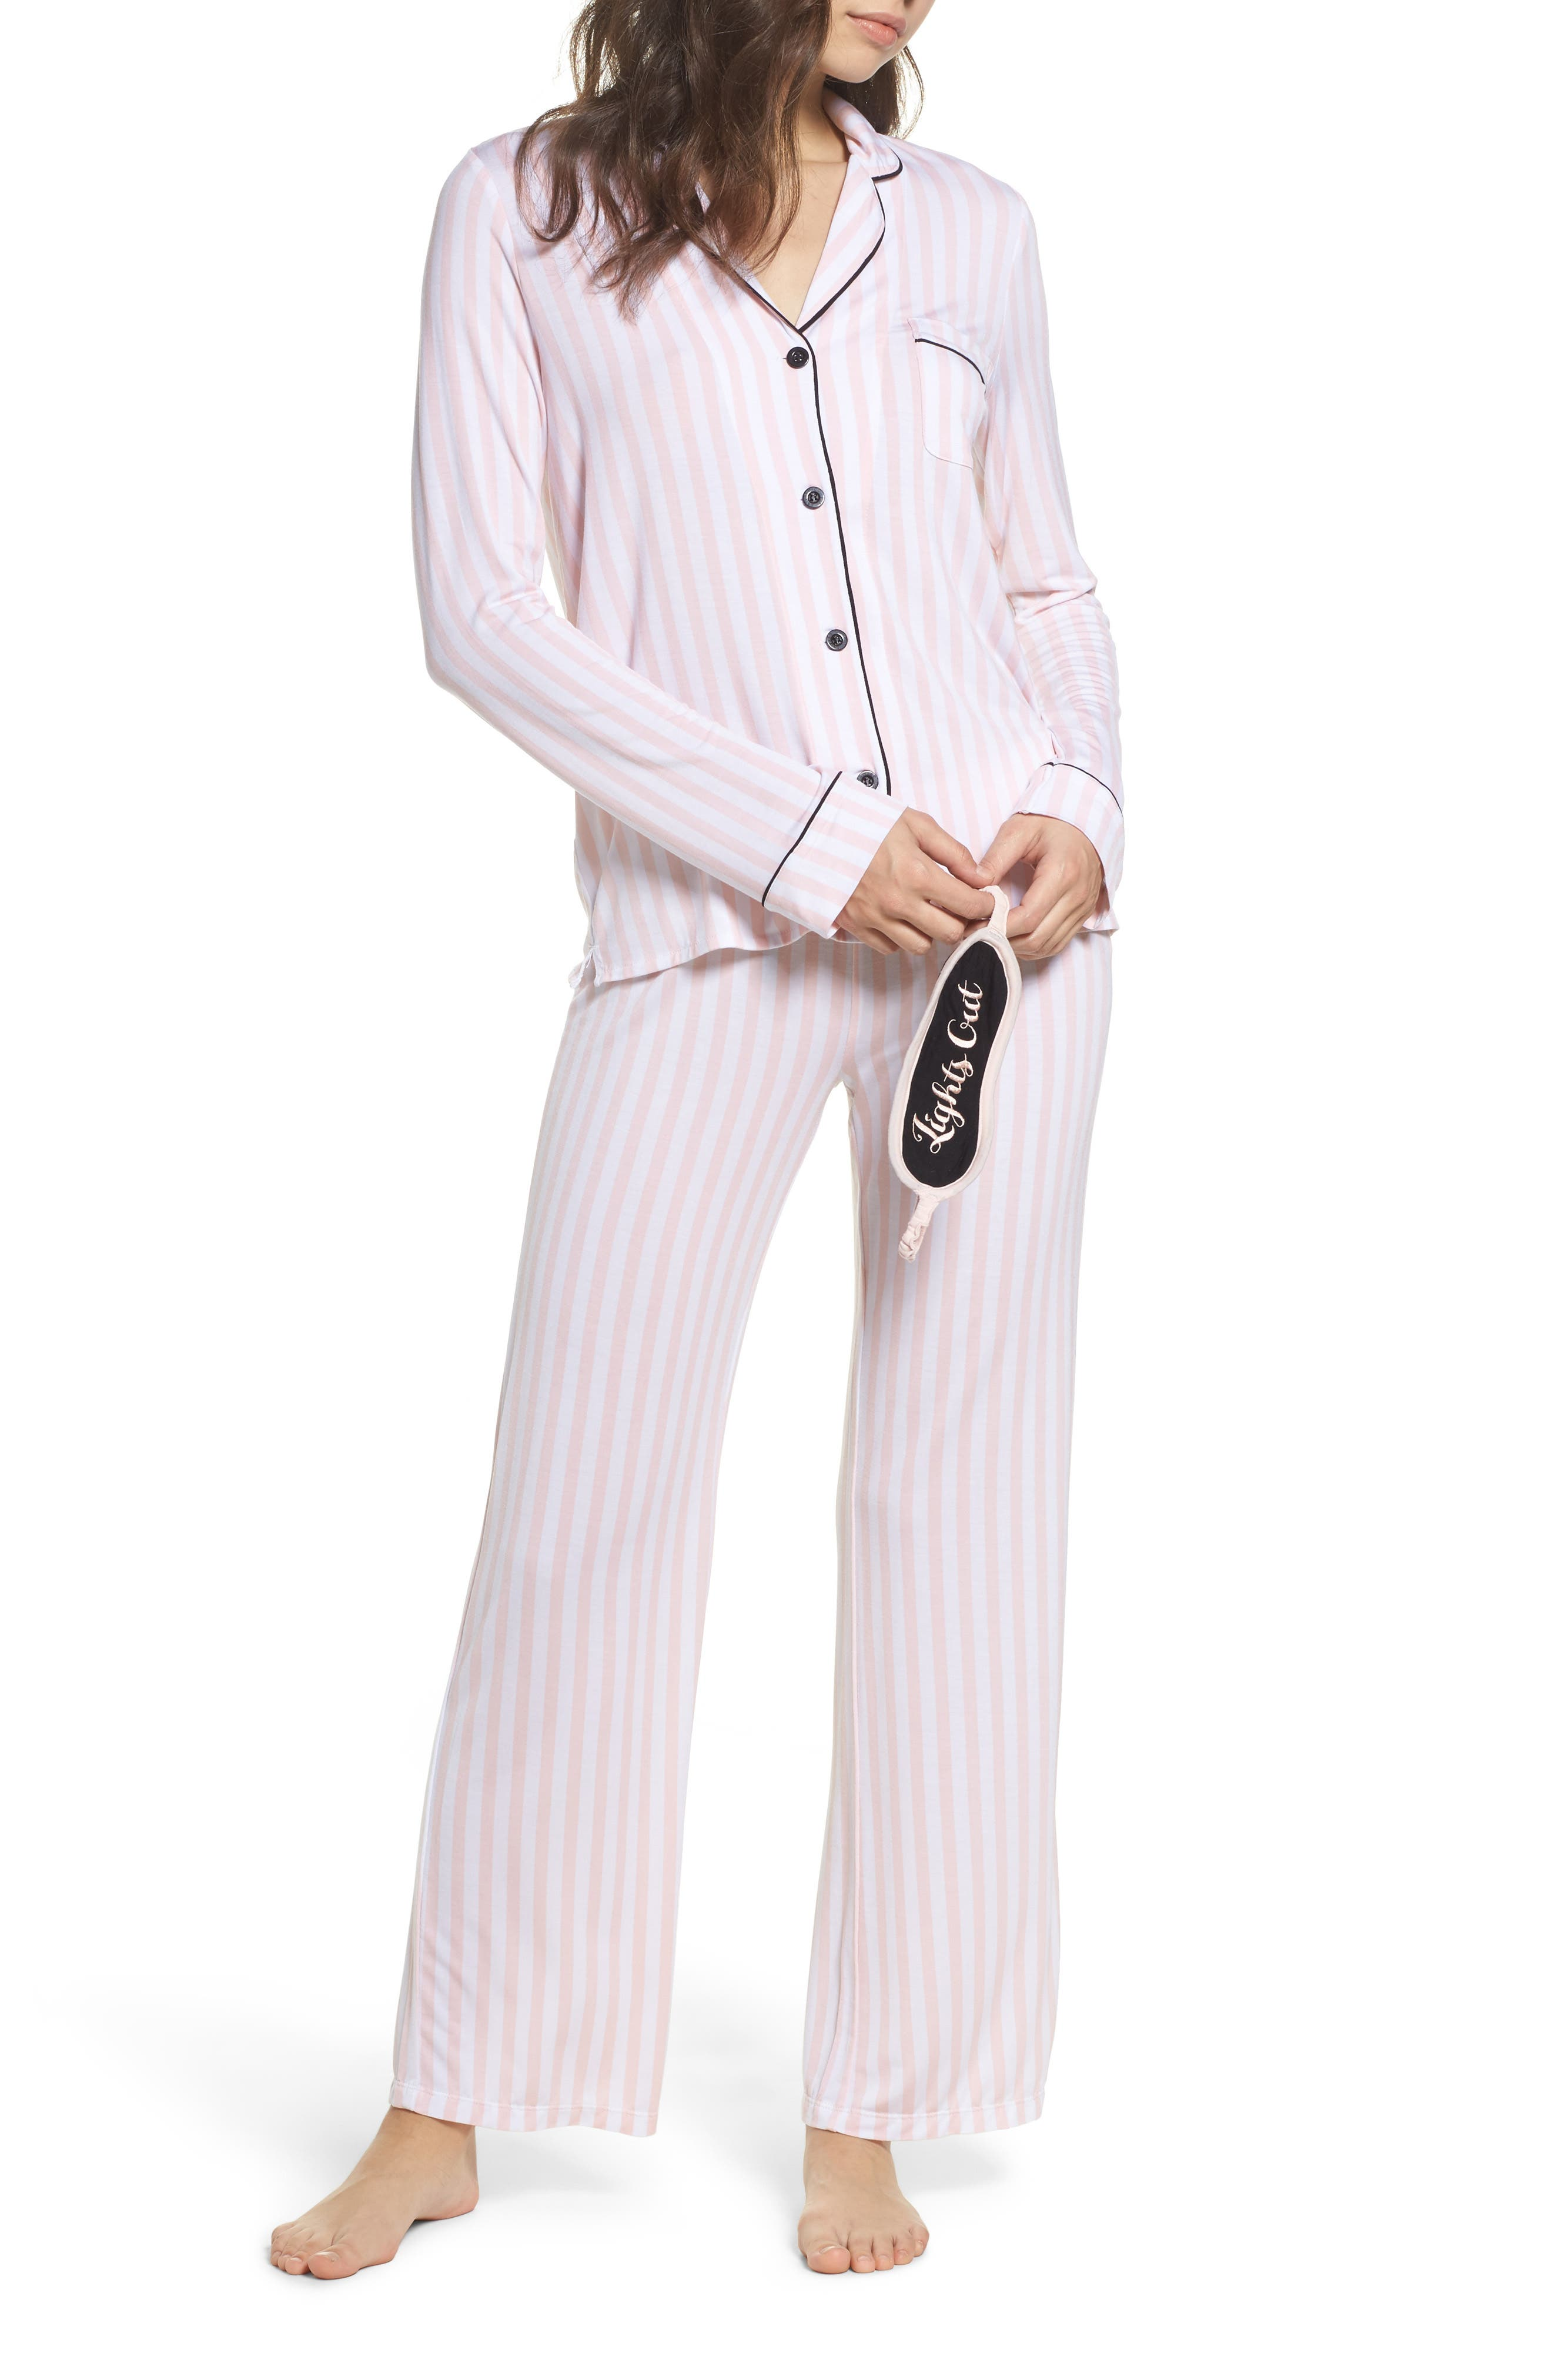 Alternate Image 1 Selected - PJ Salvage Stretch Modal Pajamas & Eye Mask